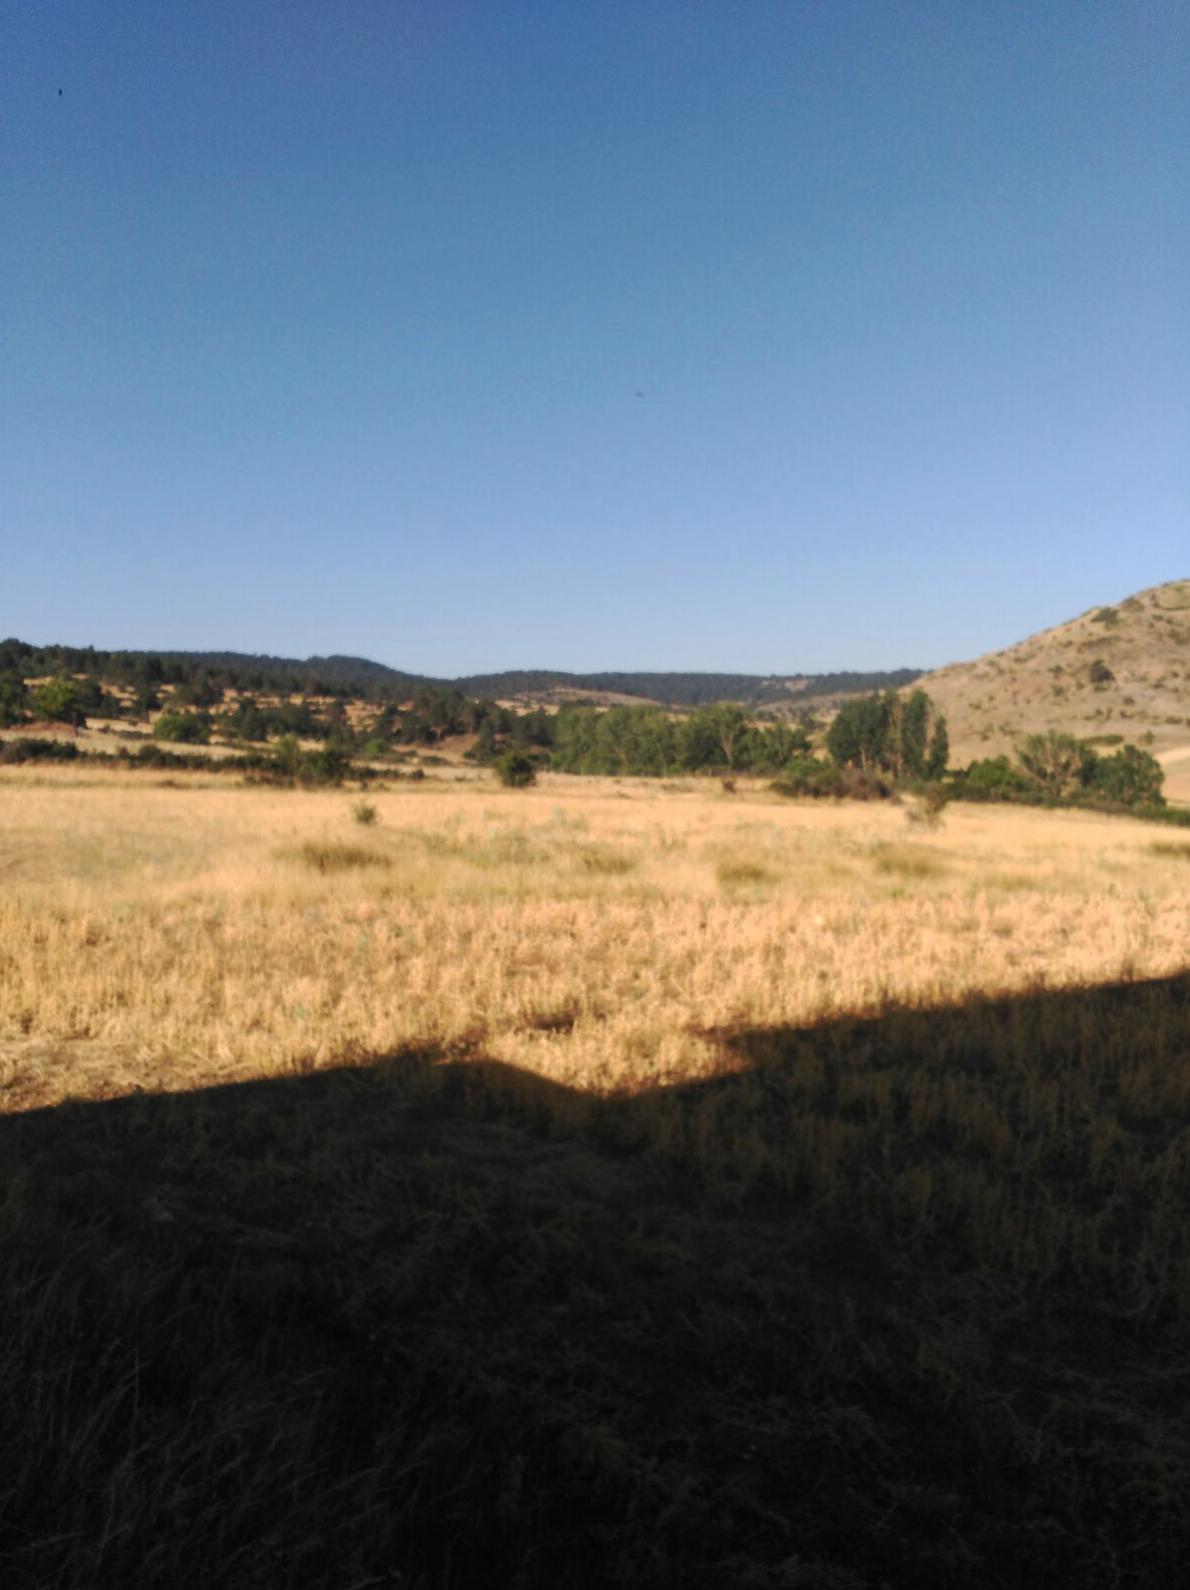 Alojamiento Rural en plena naturaleza en Guadalajara